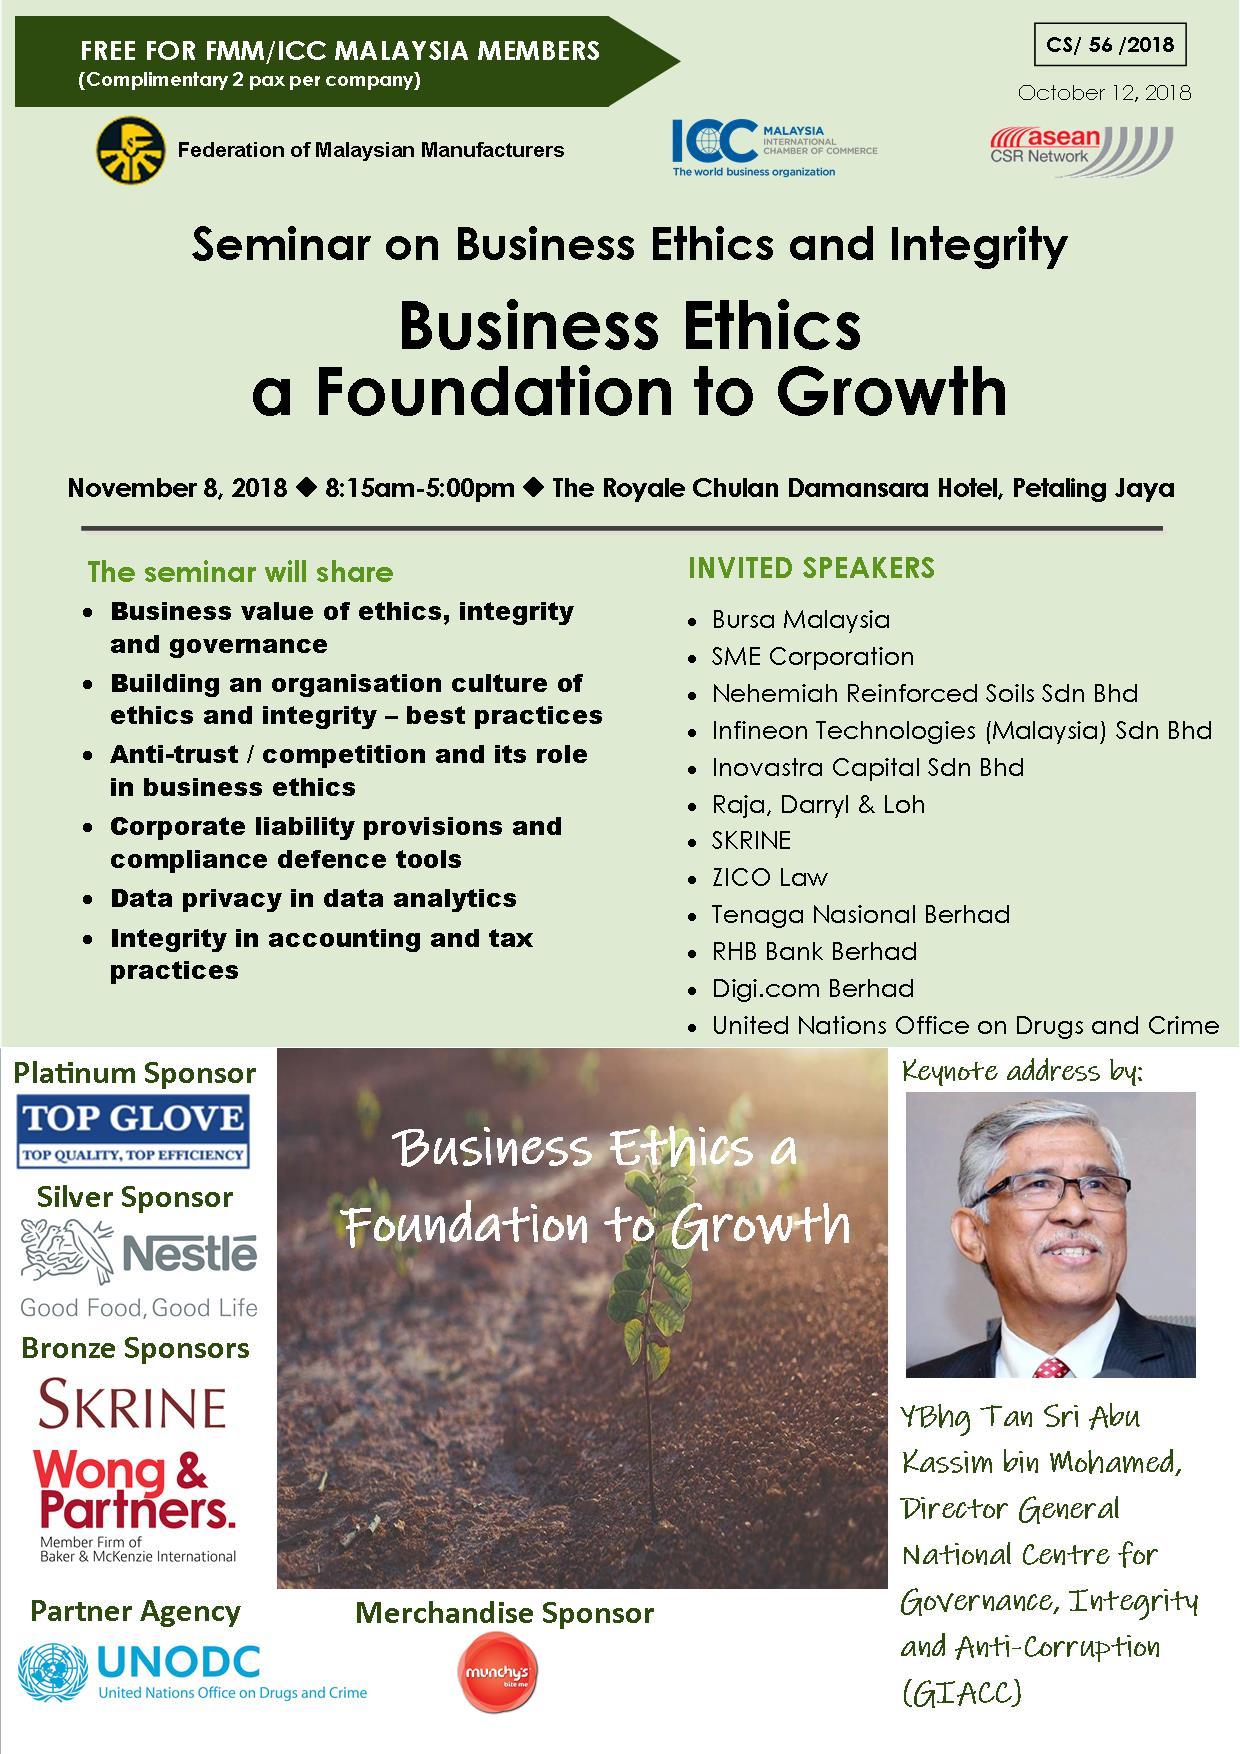 Asean CSR - Seminar on Business Ethics and Integrity, 8 Nov